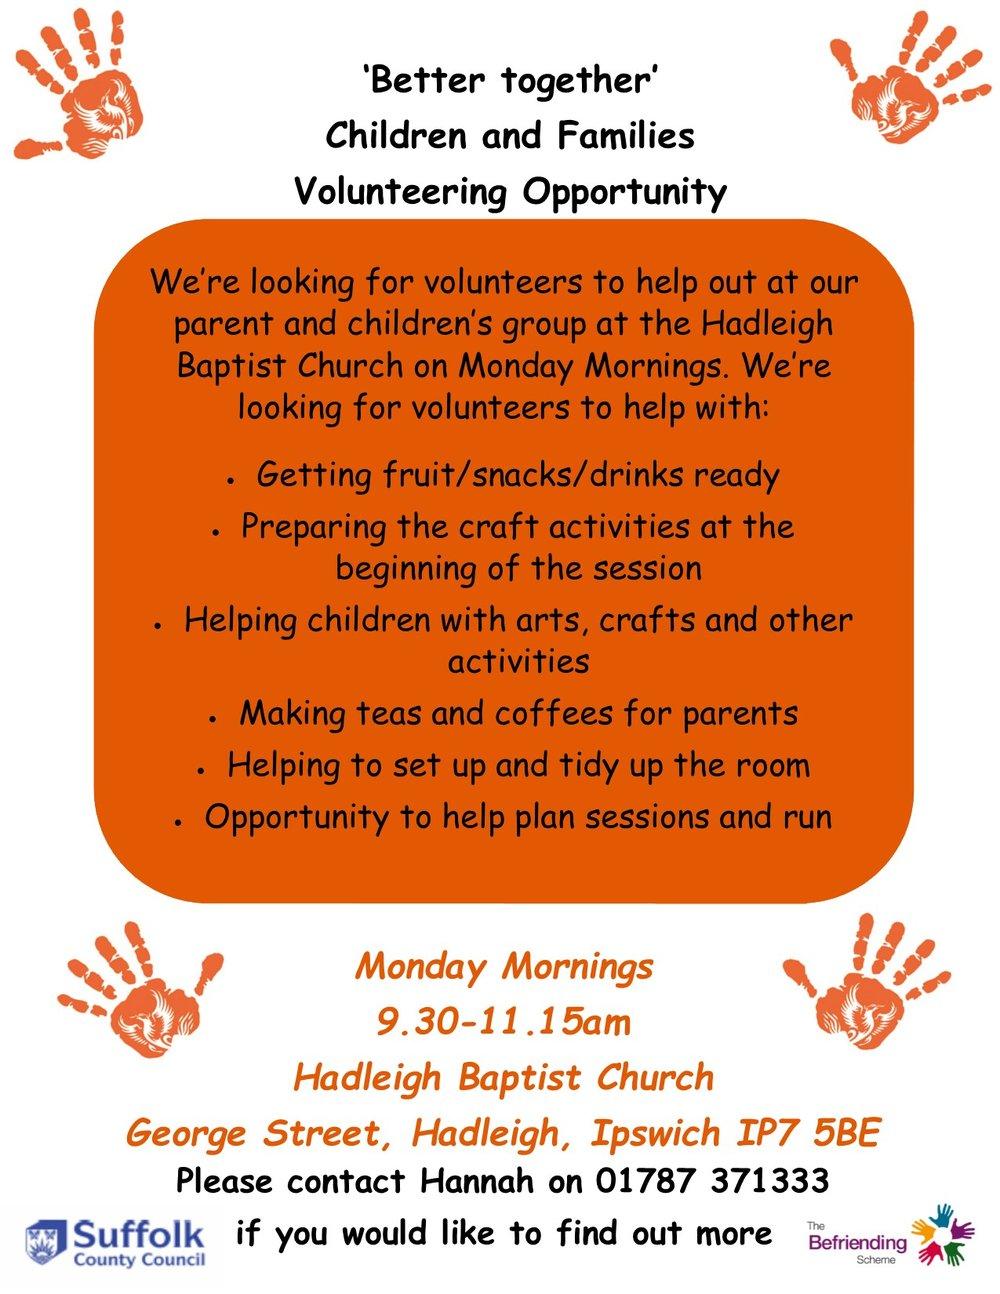 Better Together Volunteering Opportunity.jpg